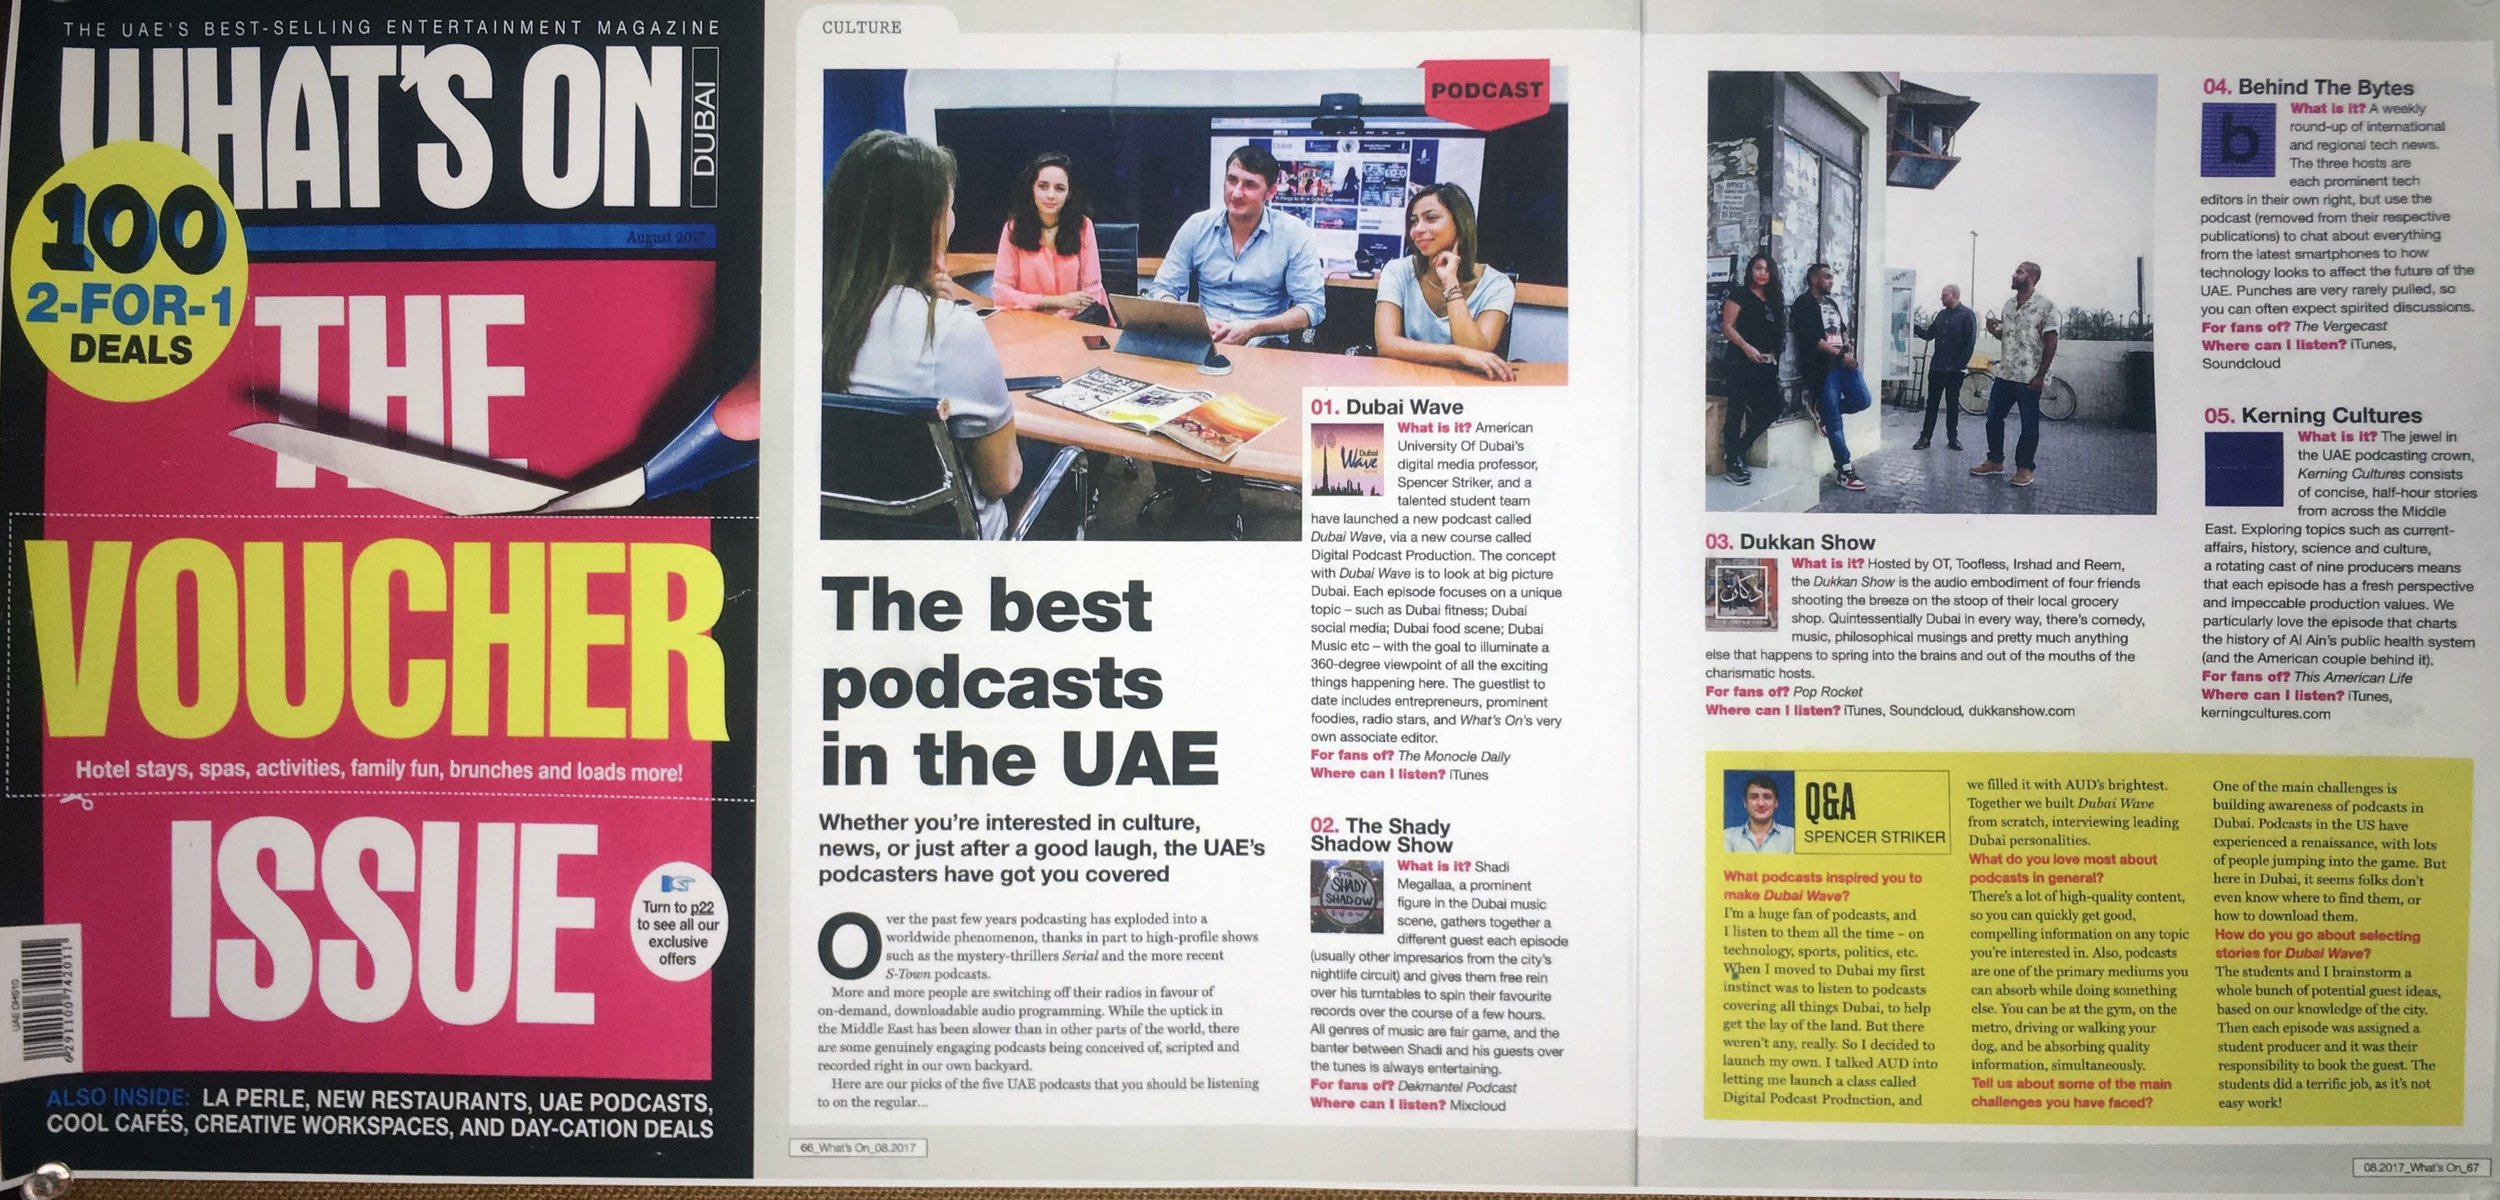 WhatsOnDubaiMag-AugIssue-SpencerStriker-DubaiWavePodcastFeature.jpg